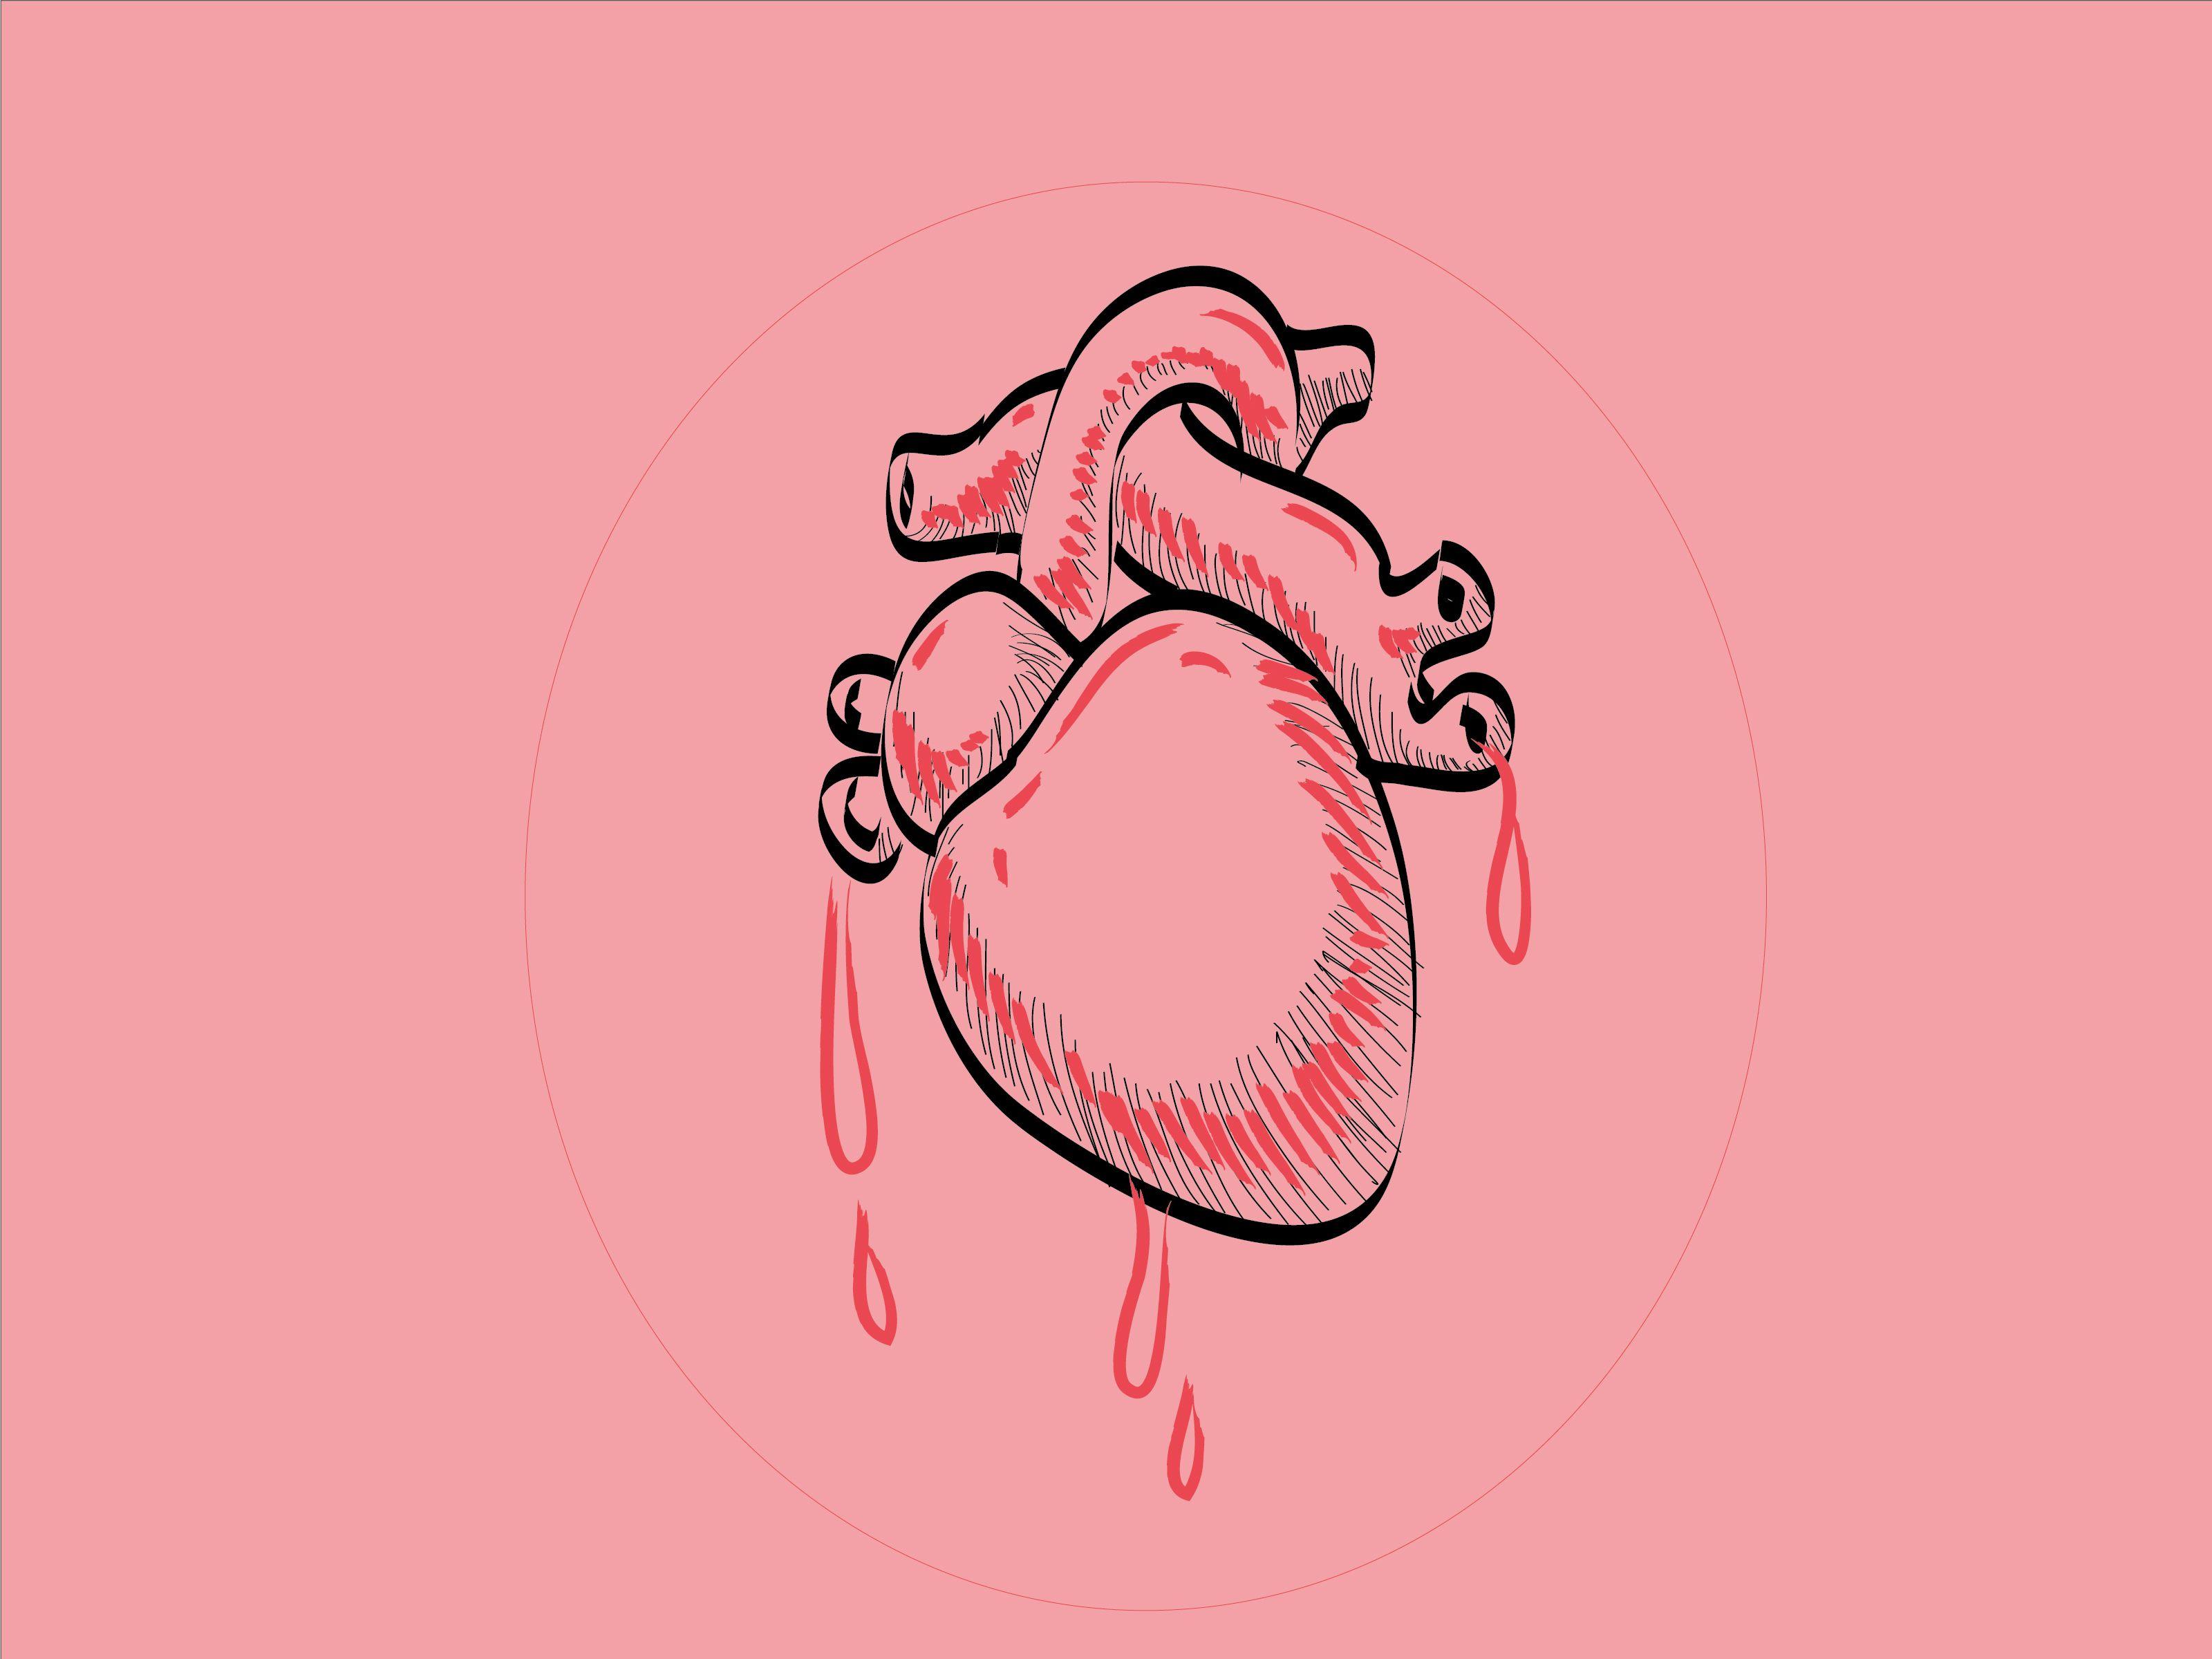 How To Draw A Human Heart Cartoon Heart Human Heart Heart Sketch